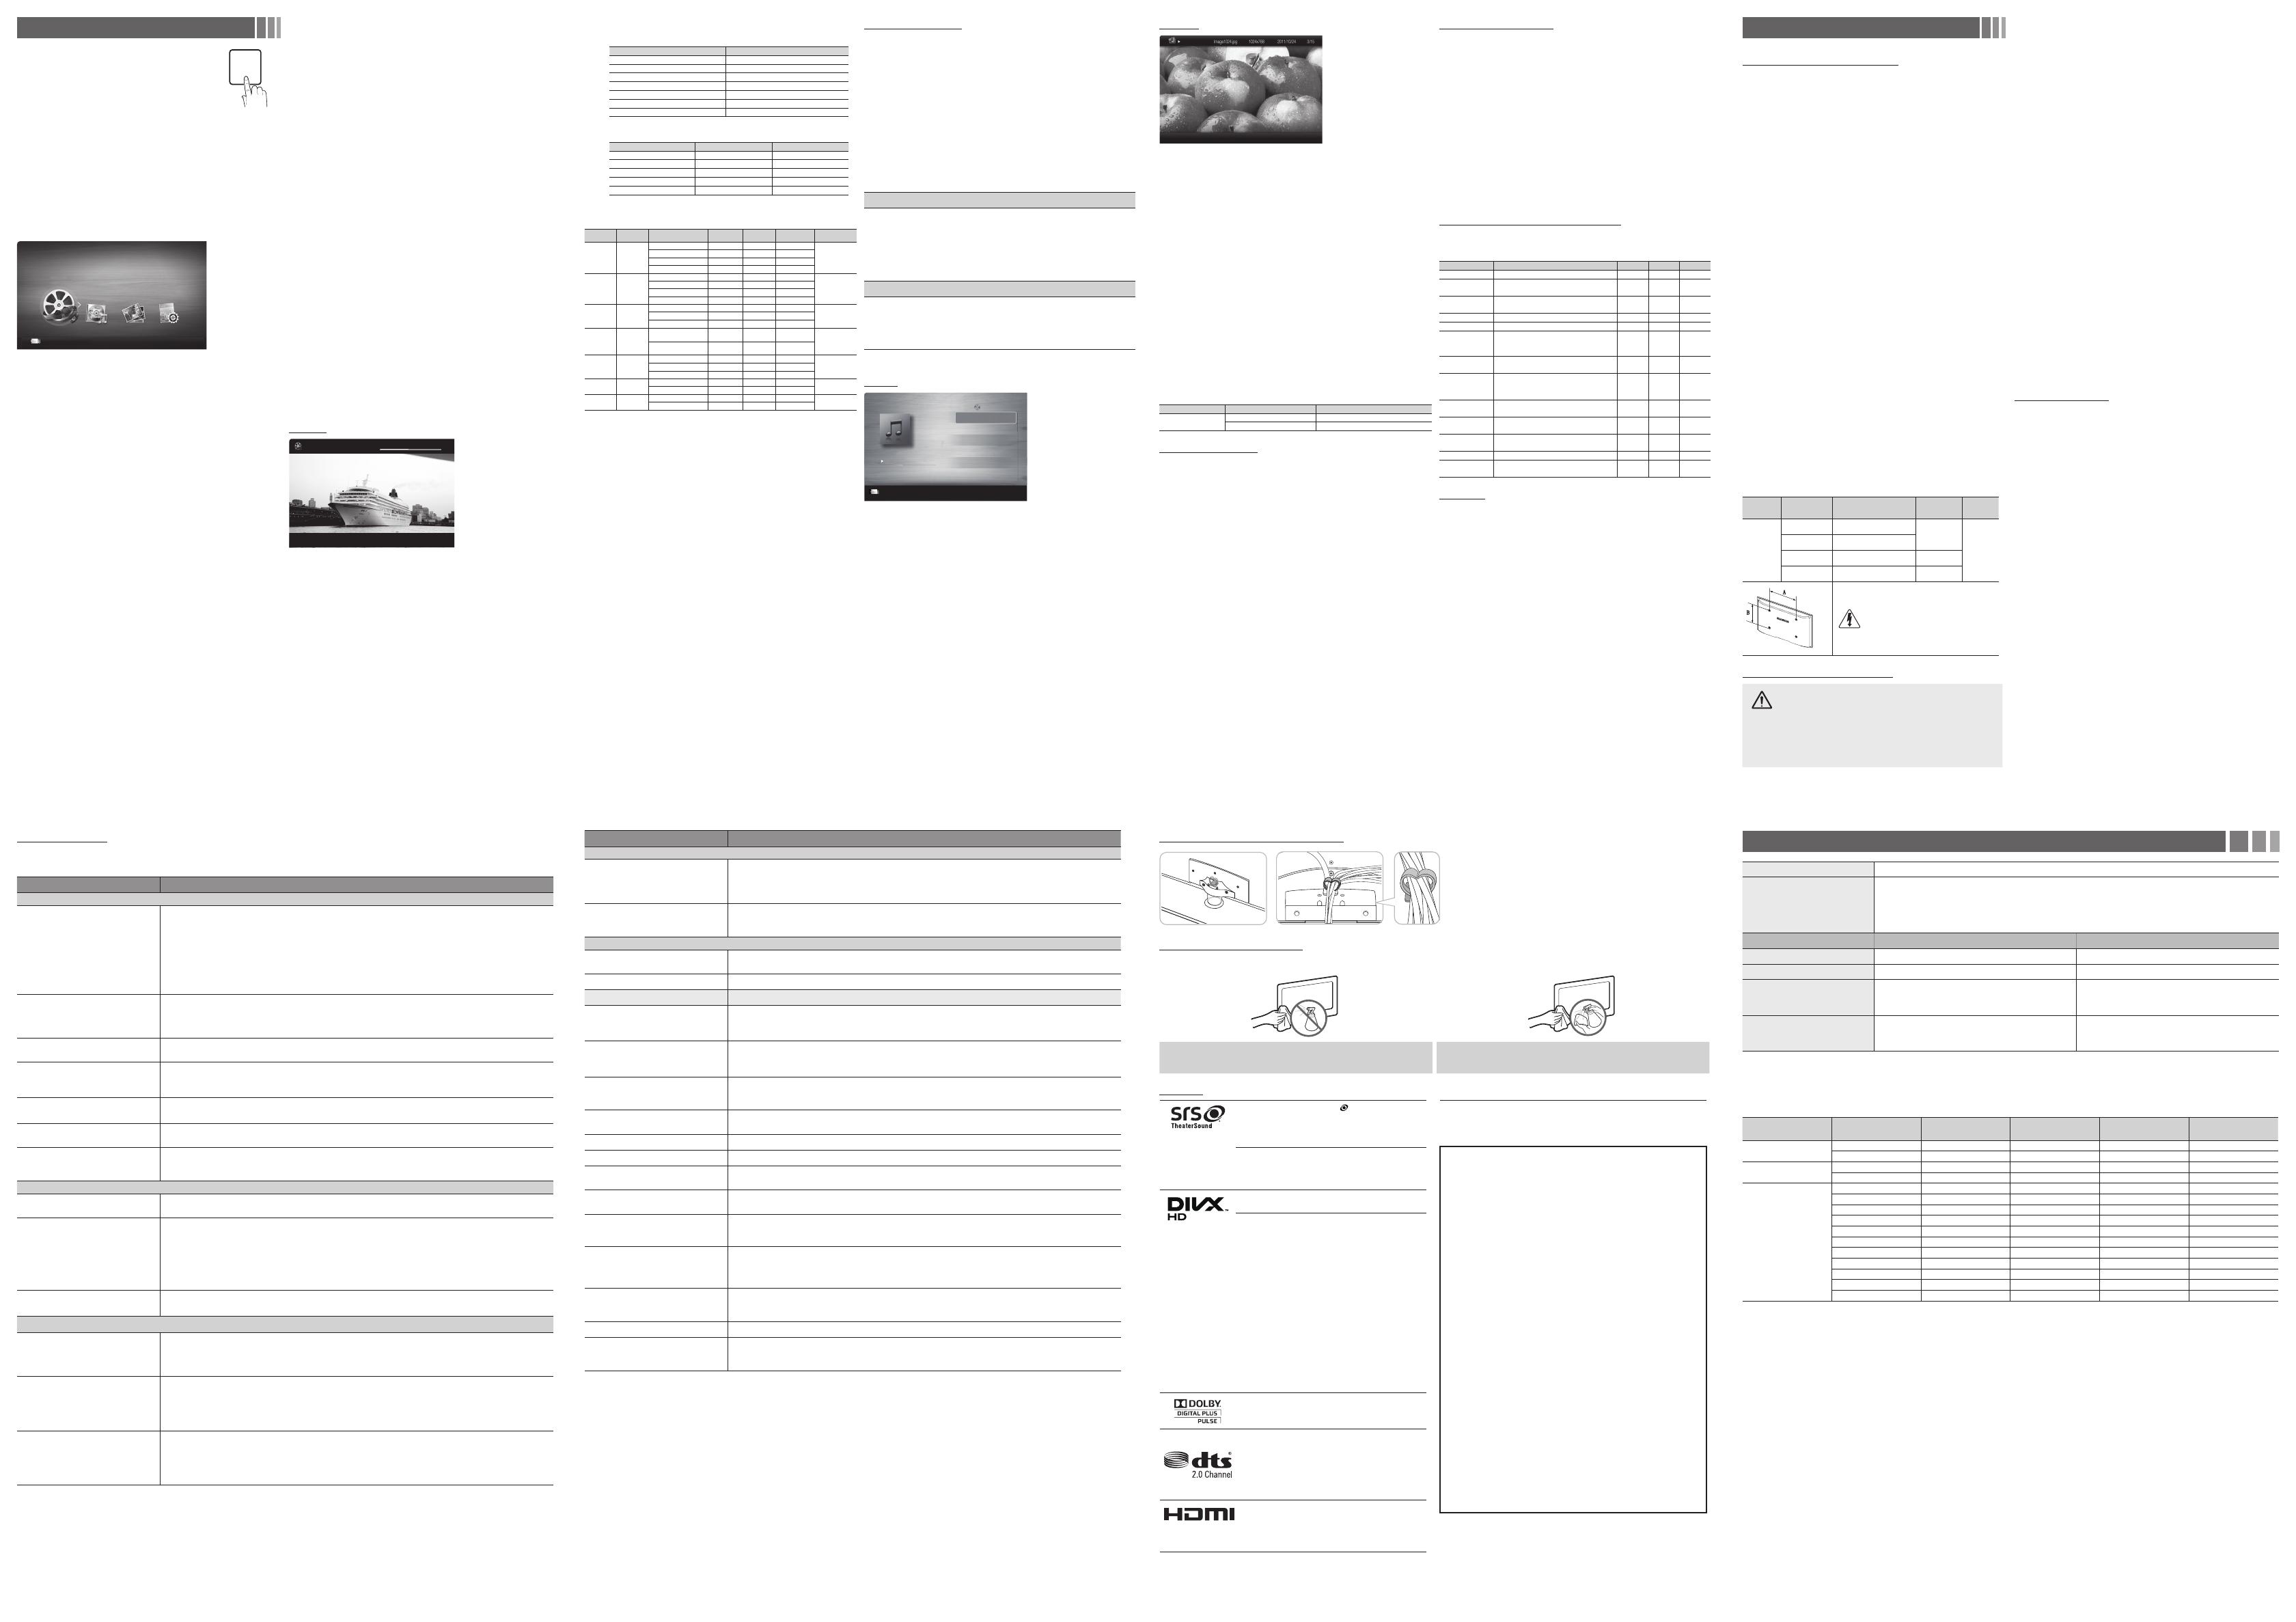 Handleiding Samsung UE32EH4003 (pagina 2 van 2) (English)